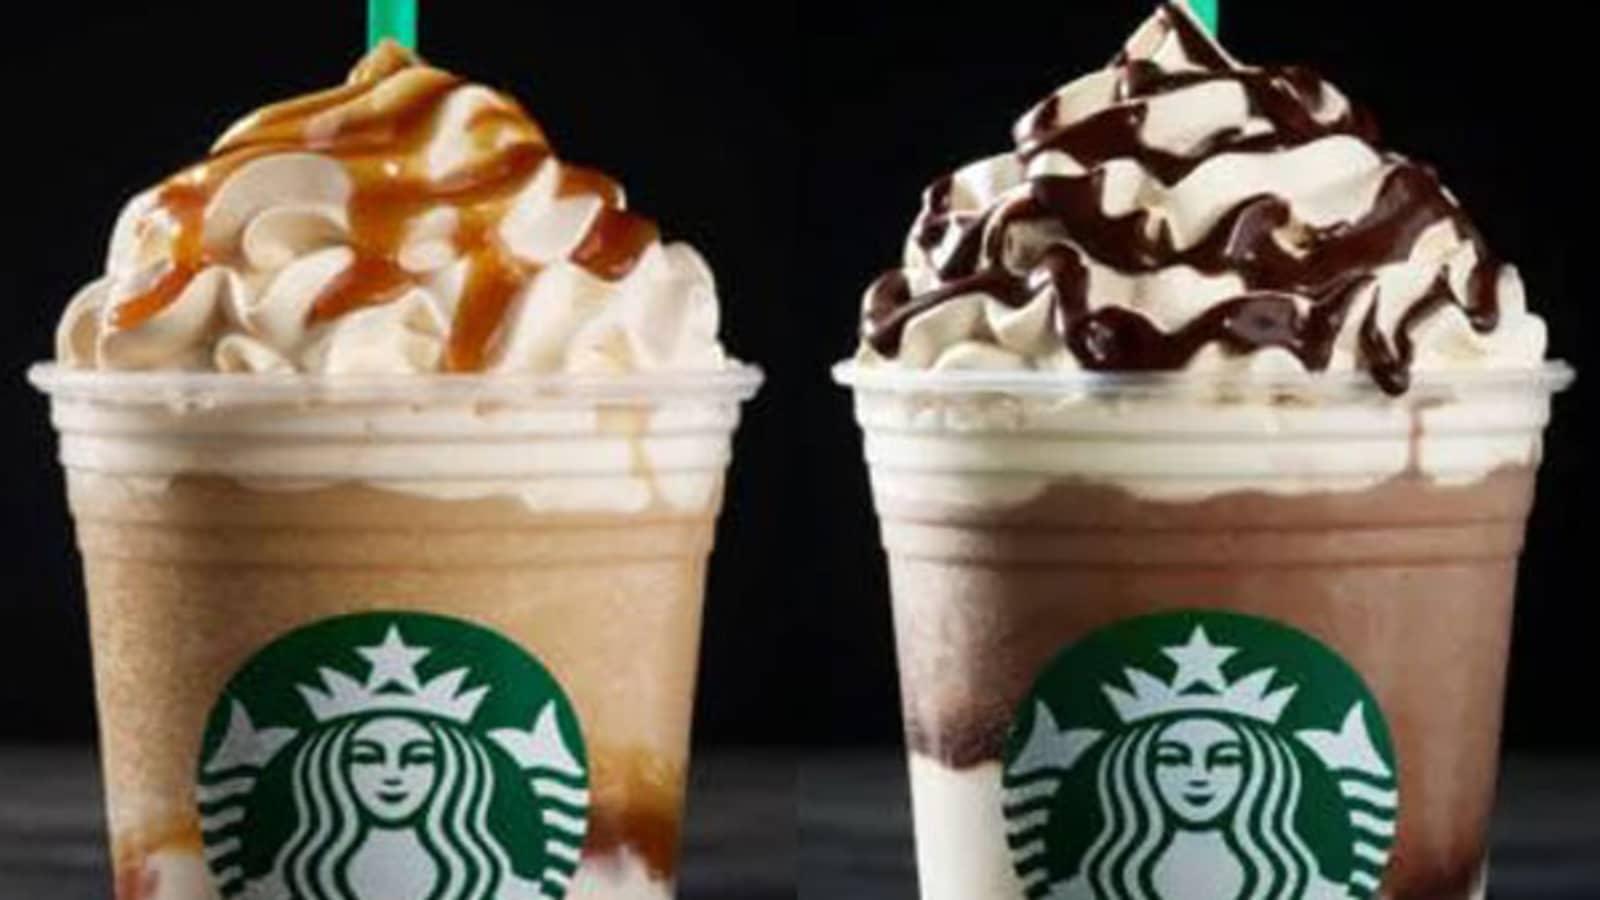 Starbucks has a 'void in innovation